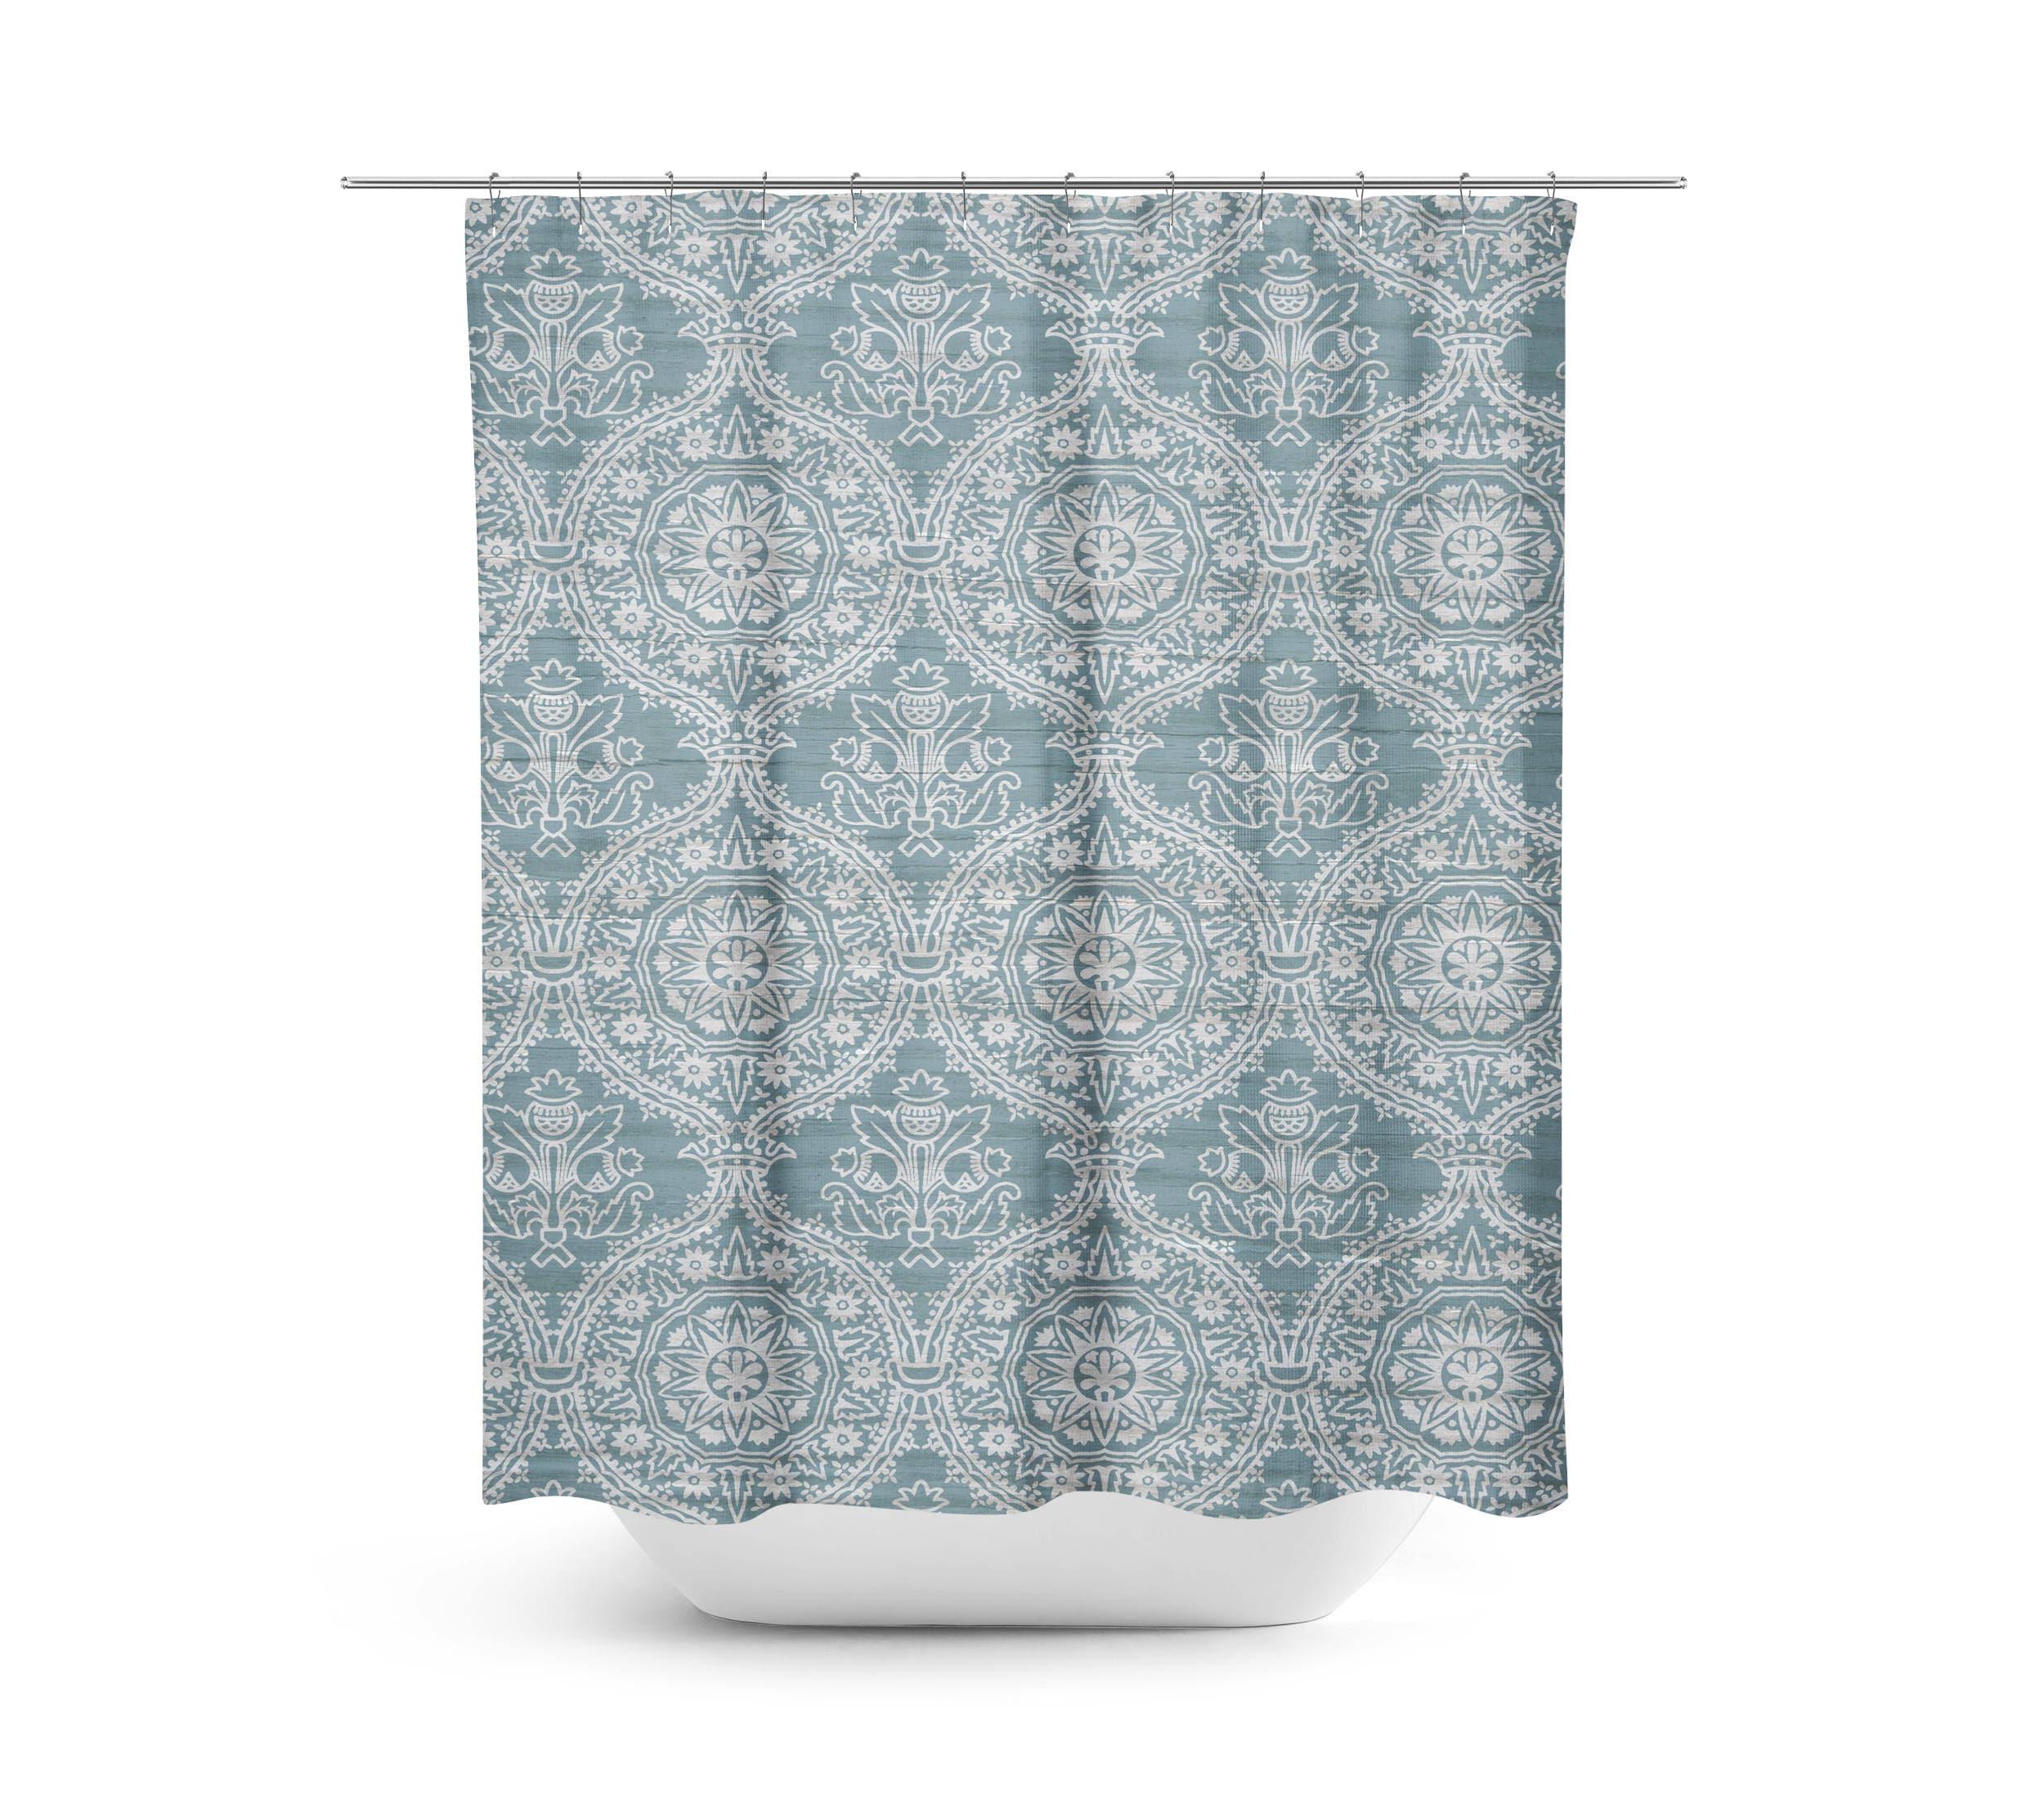 Farmhouse Shower Curtain Spa Blue Bathroom Rustic Fixer Upper Style Decor